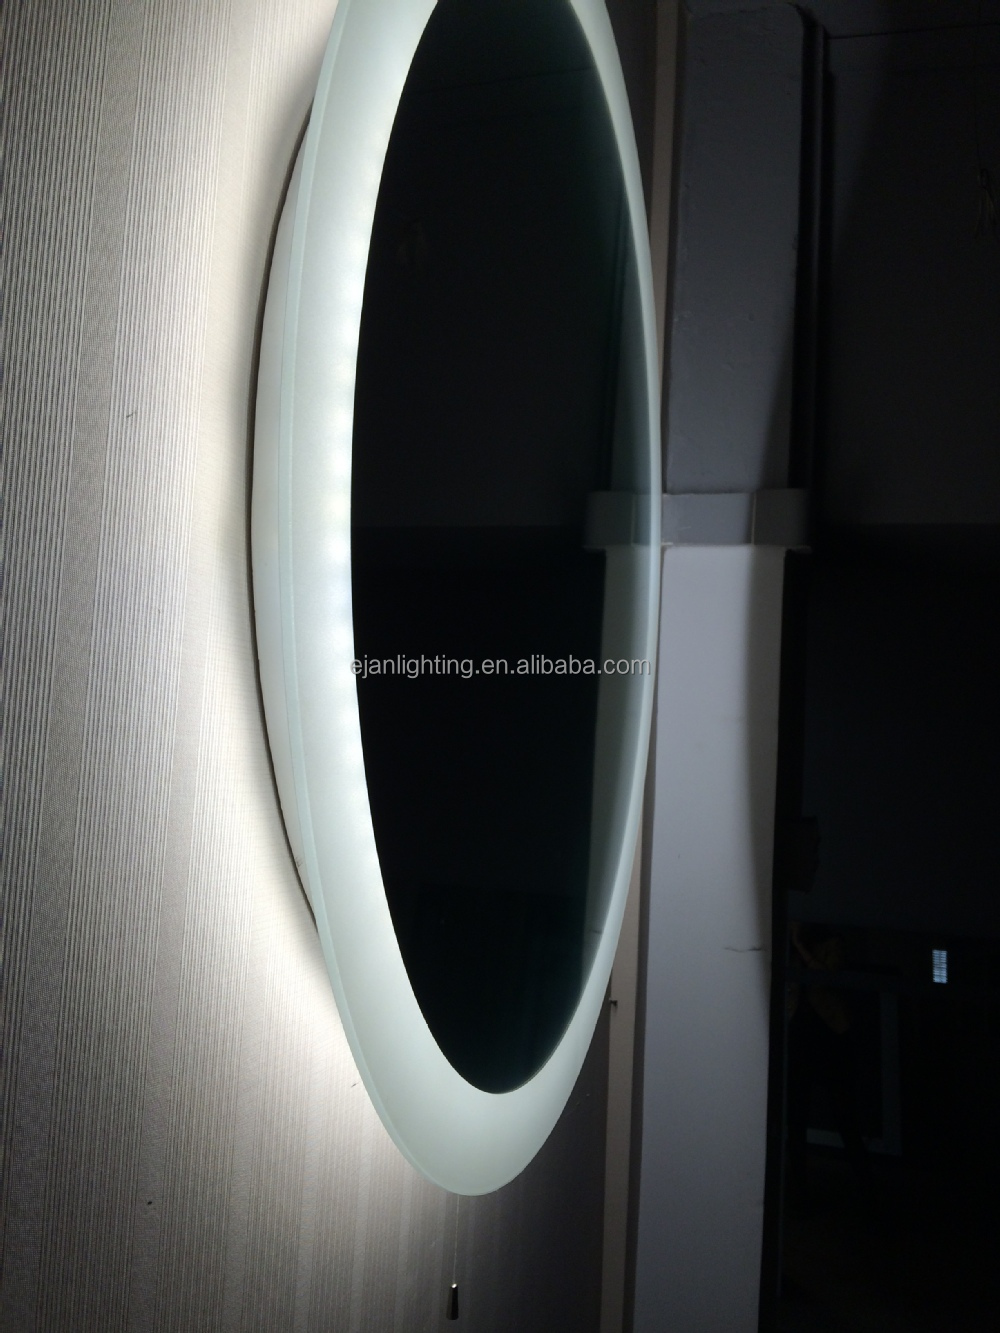 Ce Etl Cetl Led Verlicht Ovale Badkamer Spiegel - Buy Product on ...